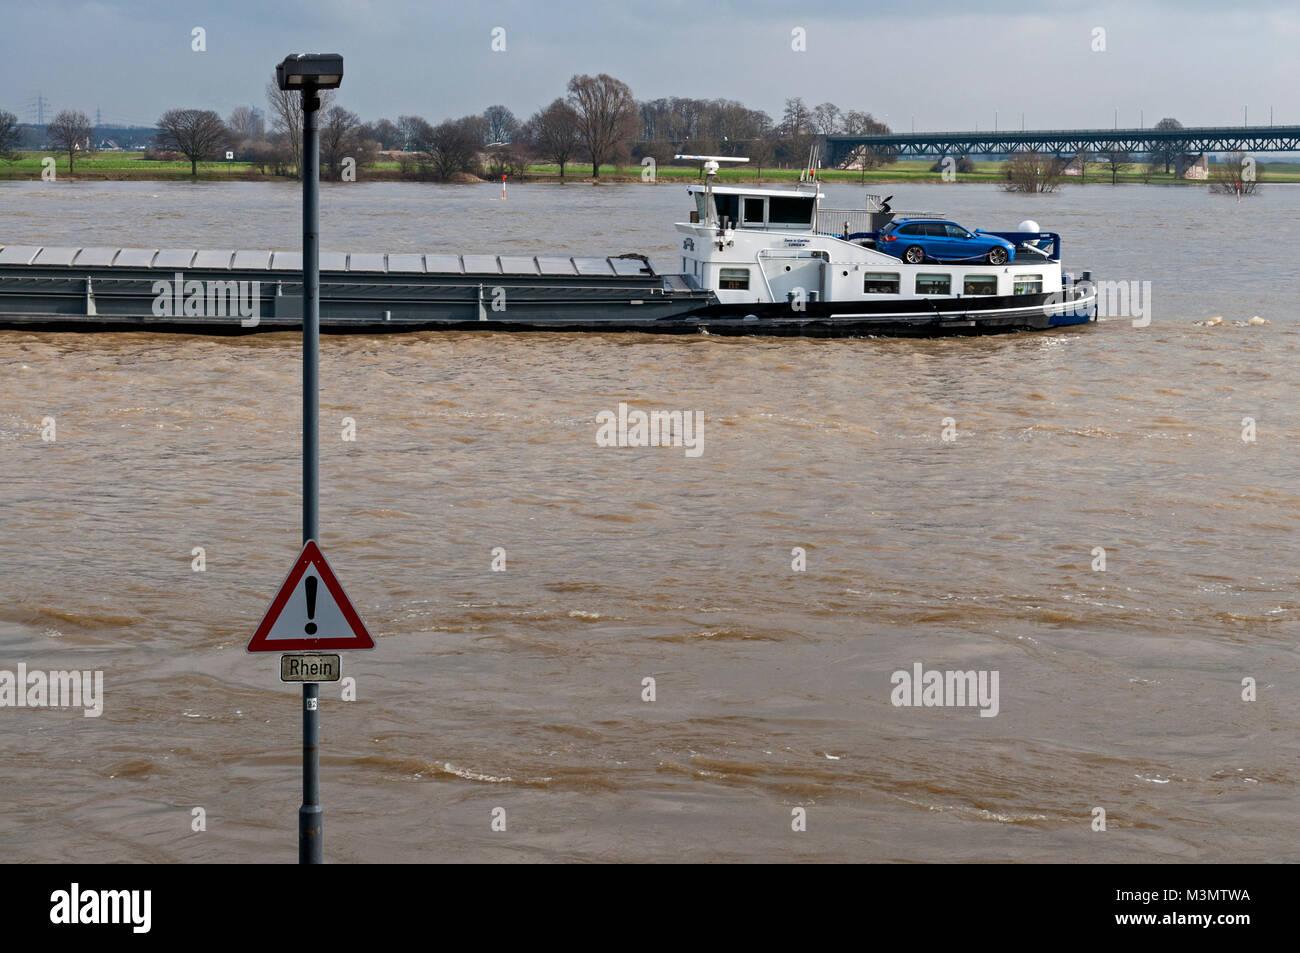 The Rhine at Krefeld-Uerdingen, NRW, Germany. Stock Photo